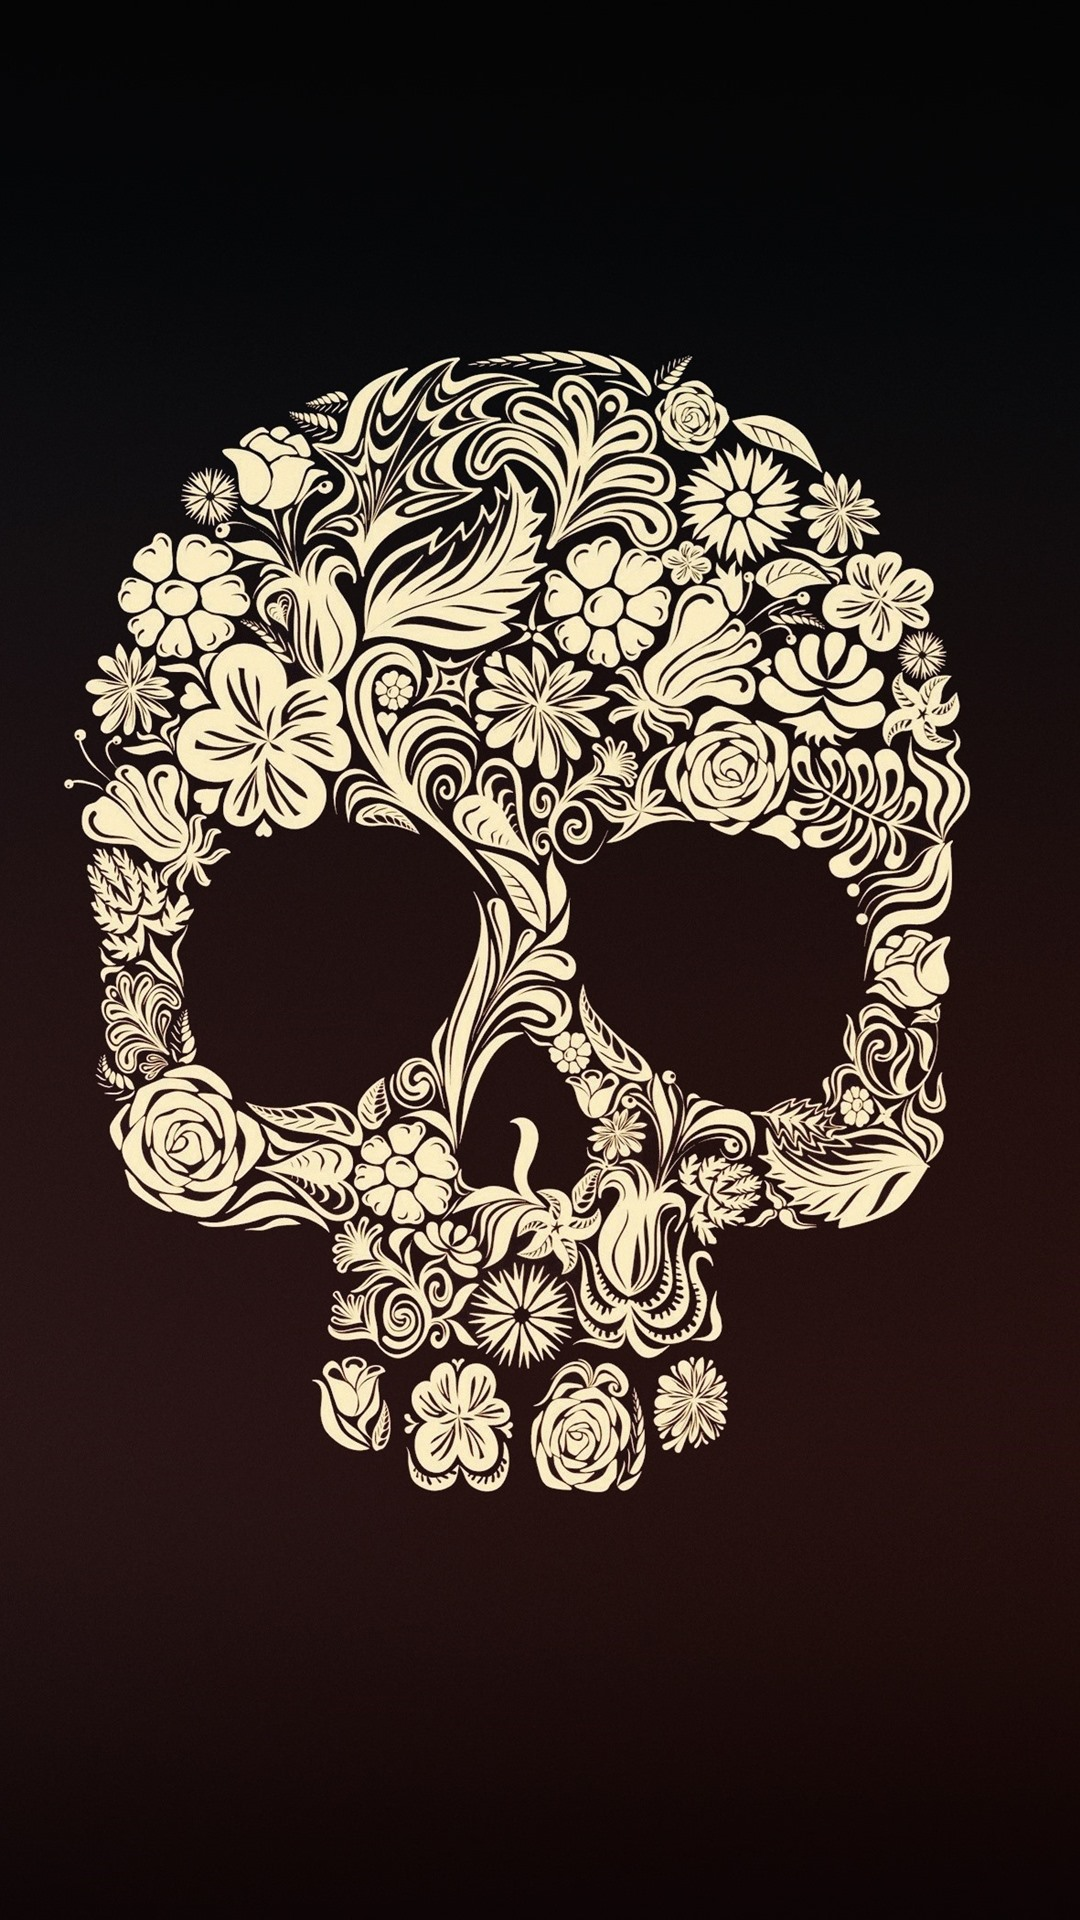 Wallpaper Iphone 6 Wallpaper Skull And Bones